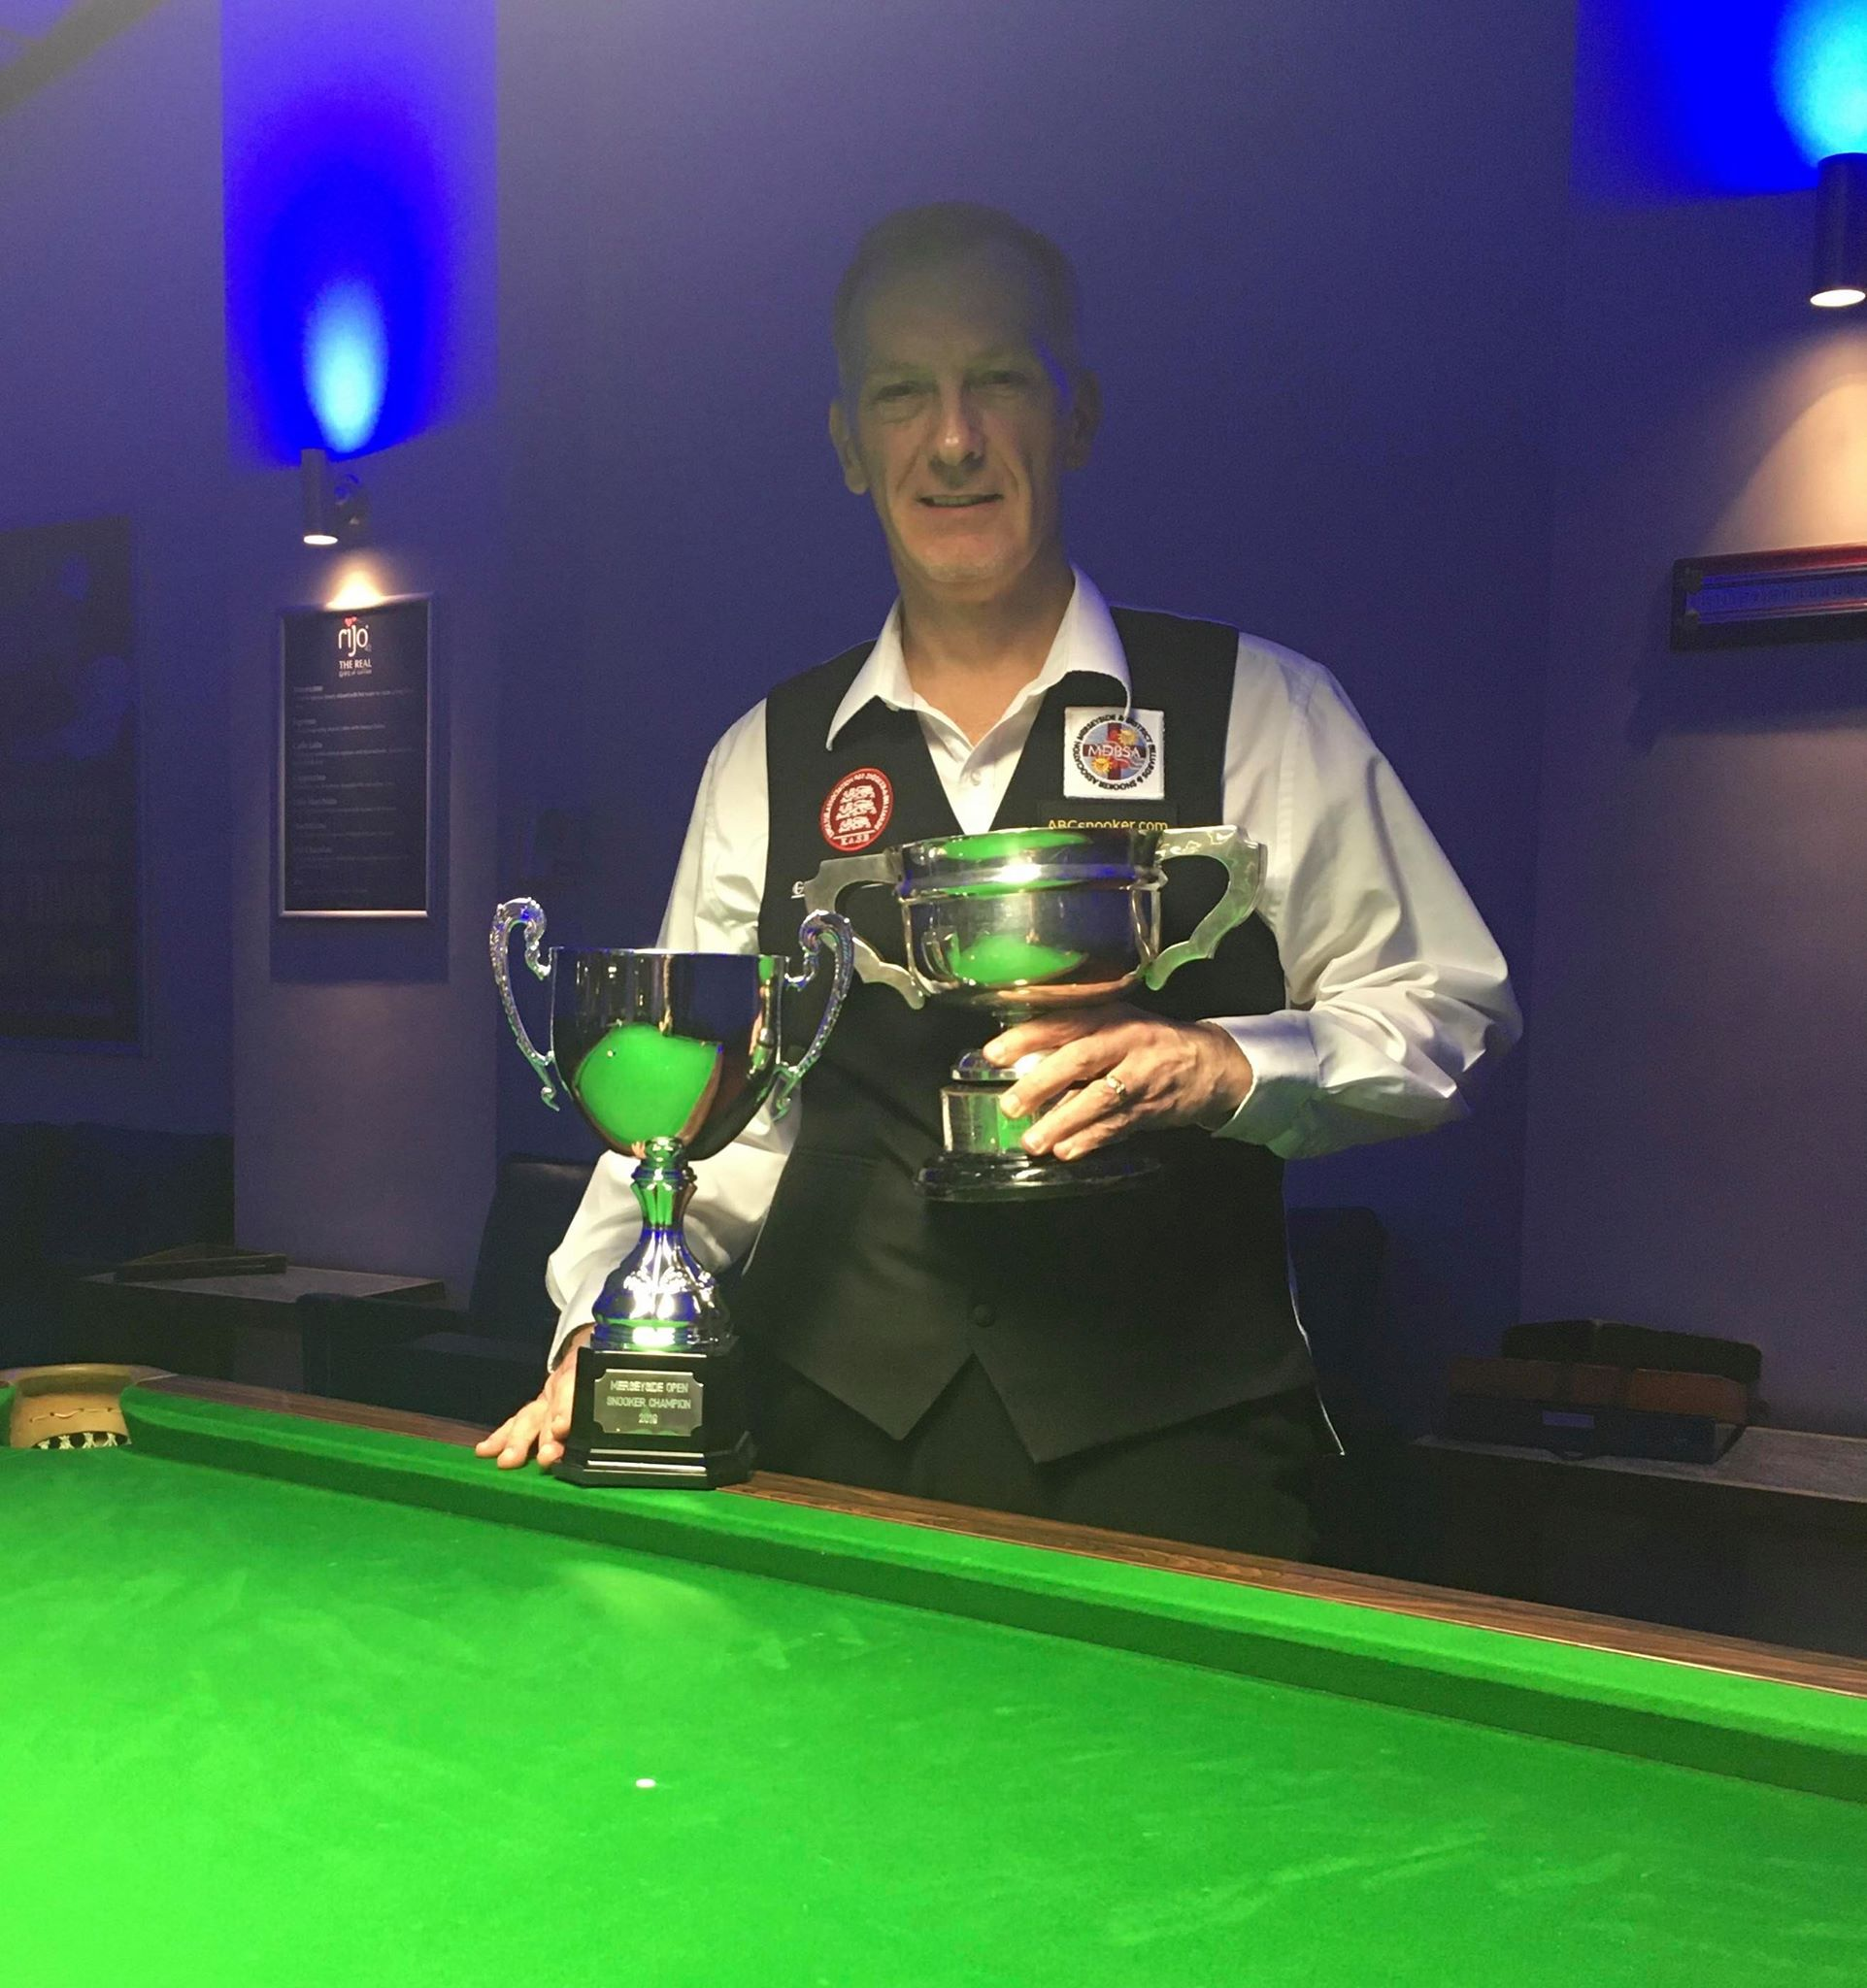 John Wlesh Winner